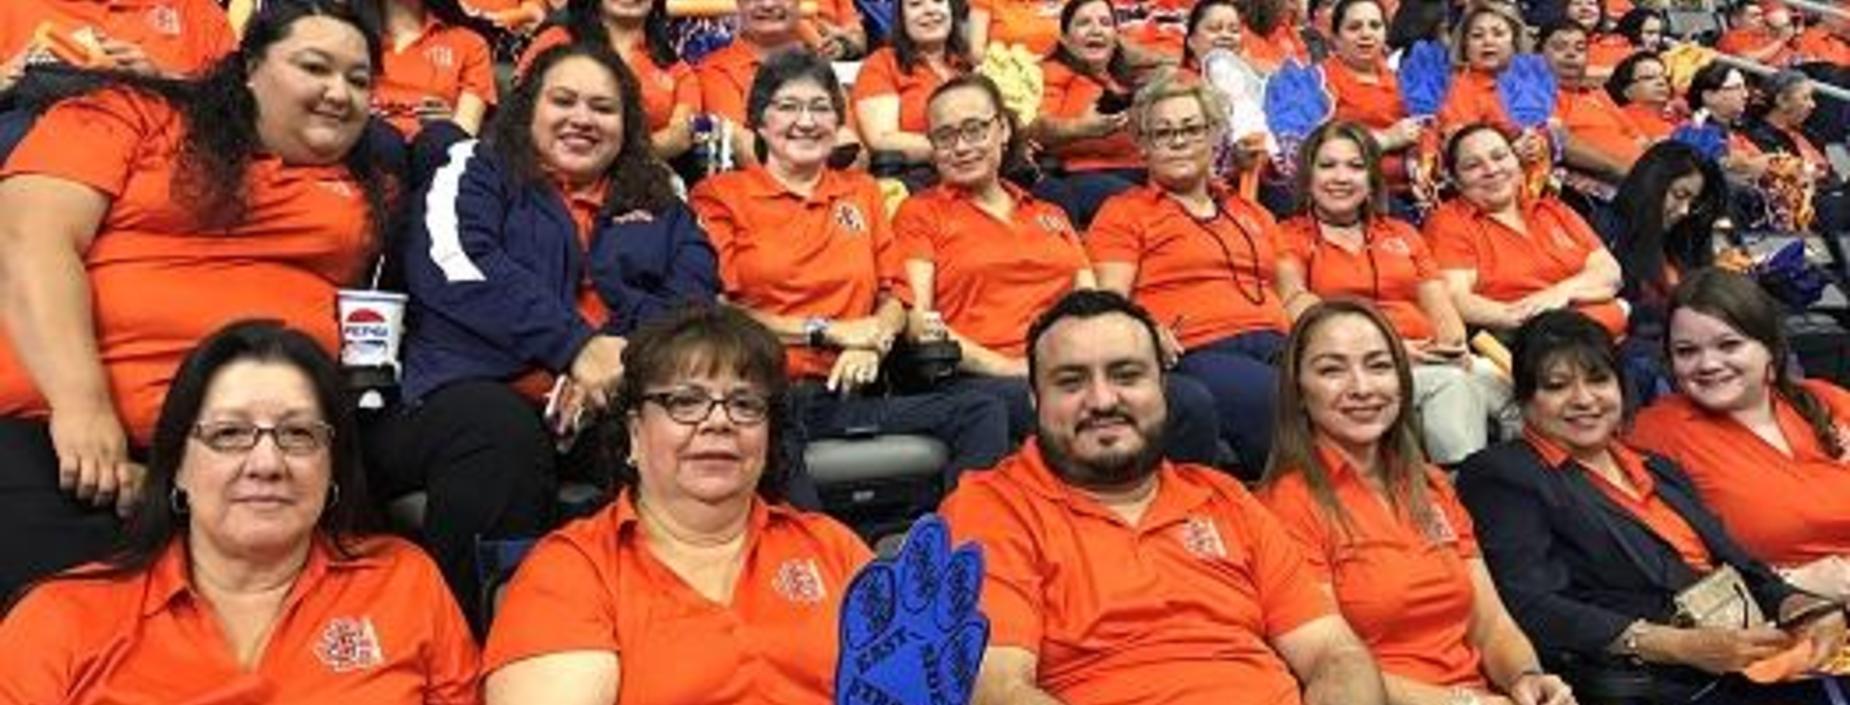 JEHS Staff at Bert Ogden Arena 2019